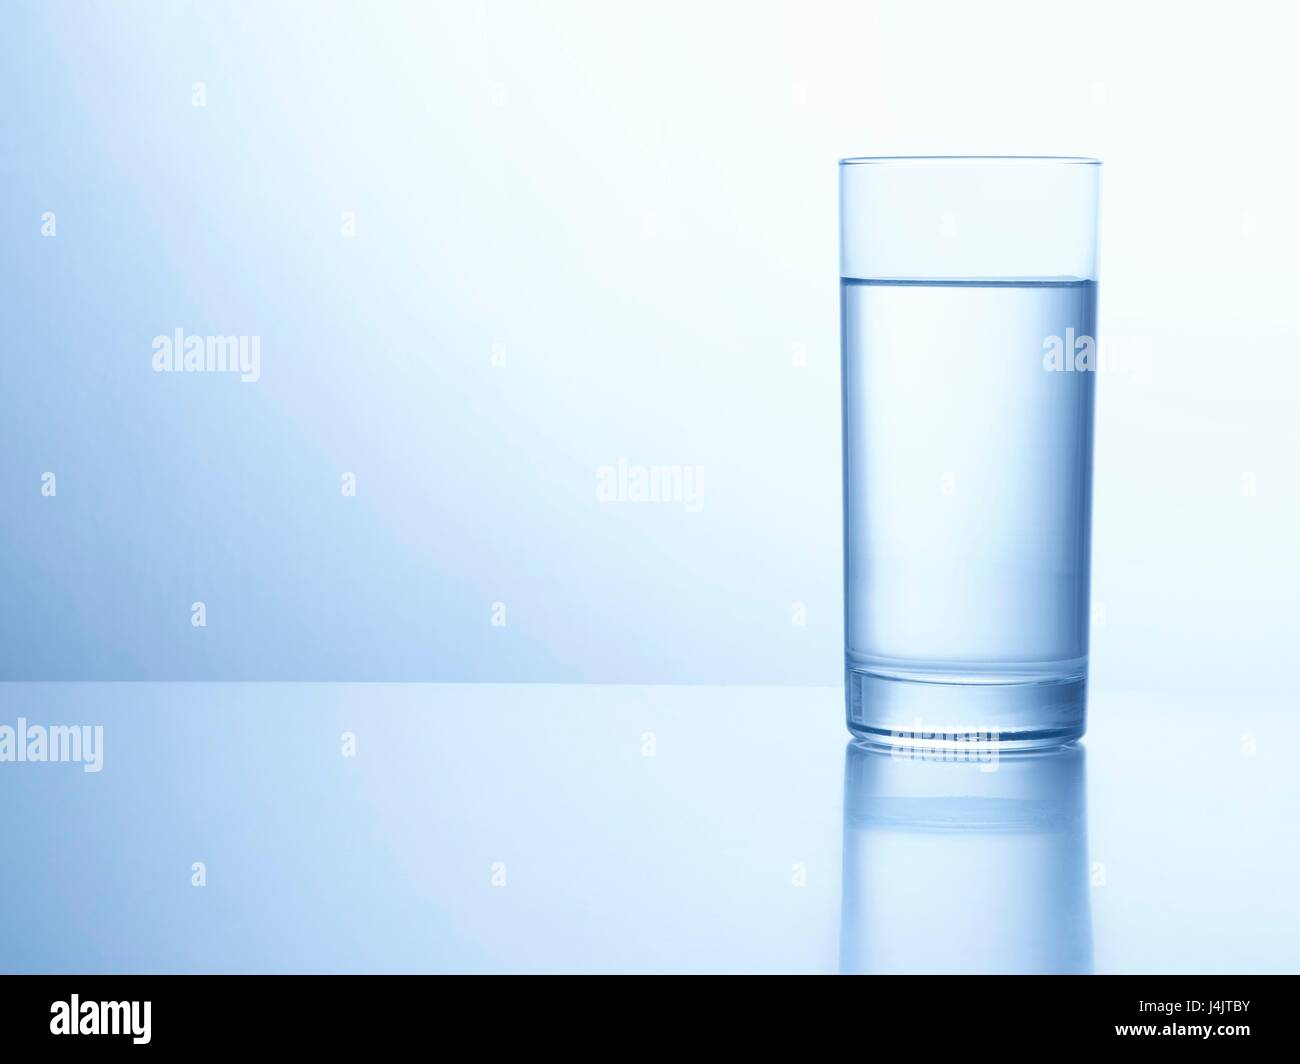 Vaso de agua, Foto de estudio. Imagen De Stock